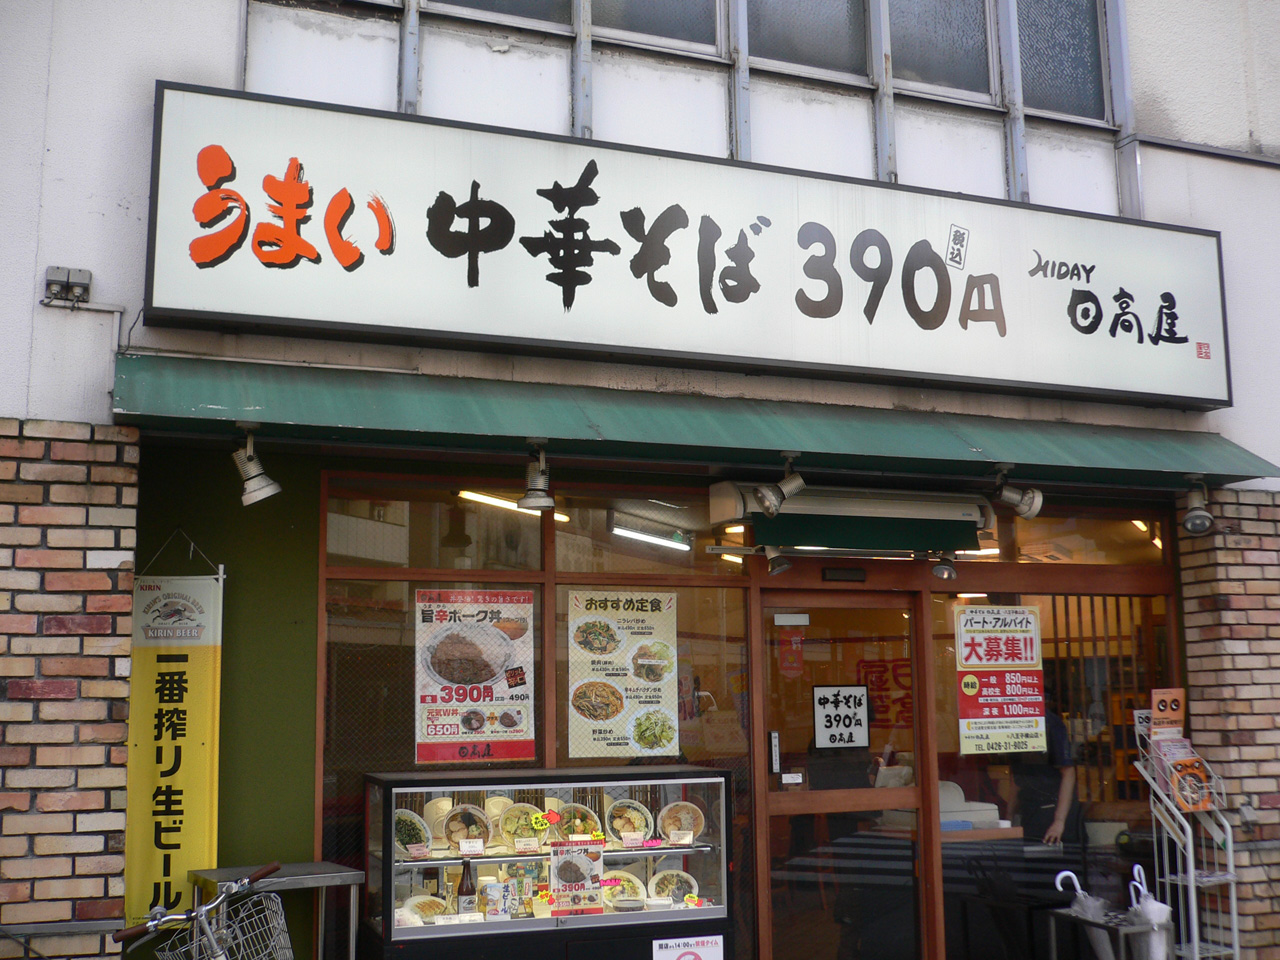 http://livedoor.blogimg.jp/ramenkoikesan/imgs/3/9/3969bcab.jpg